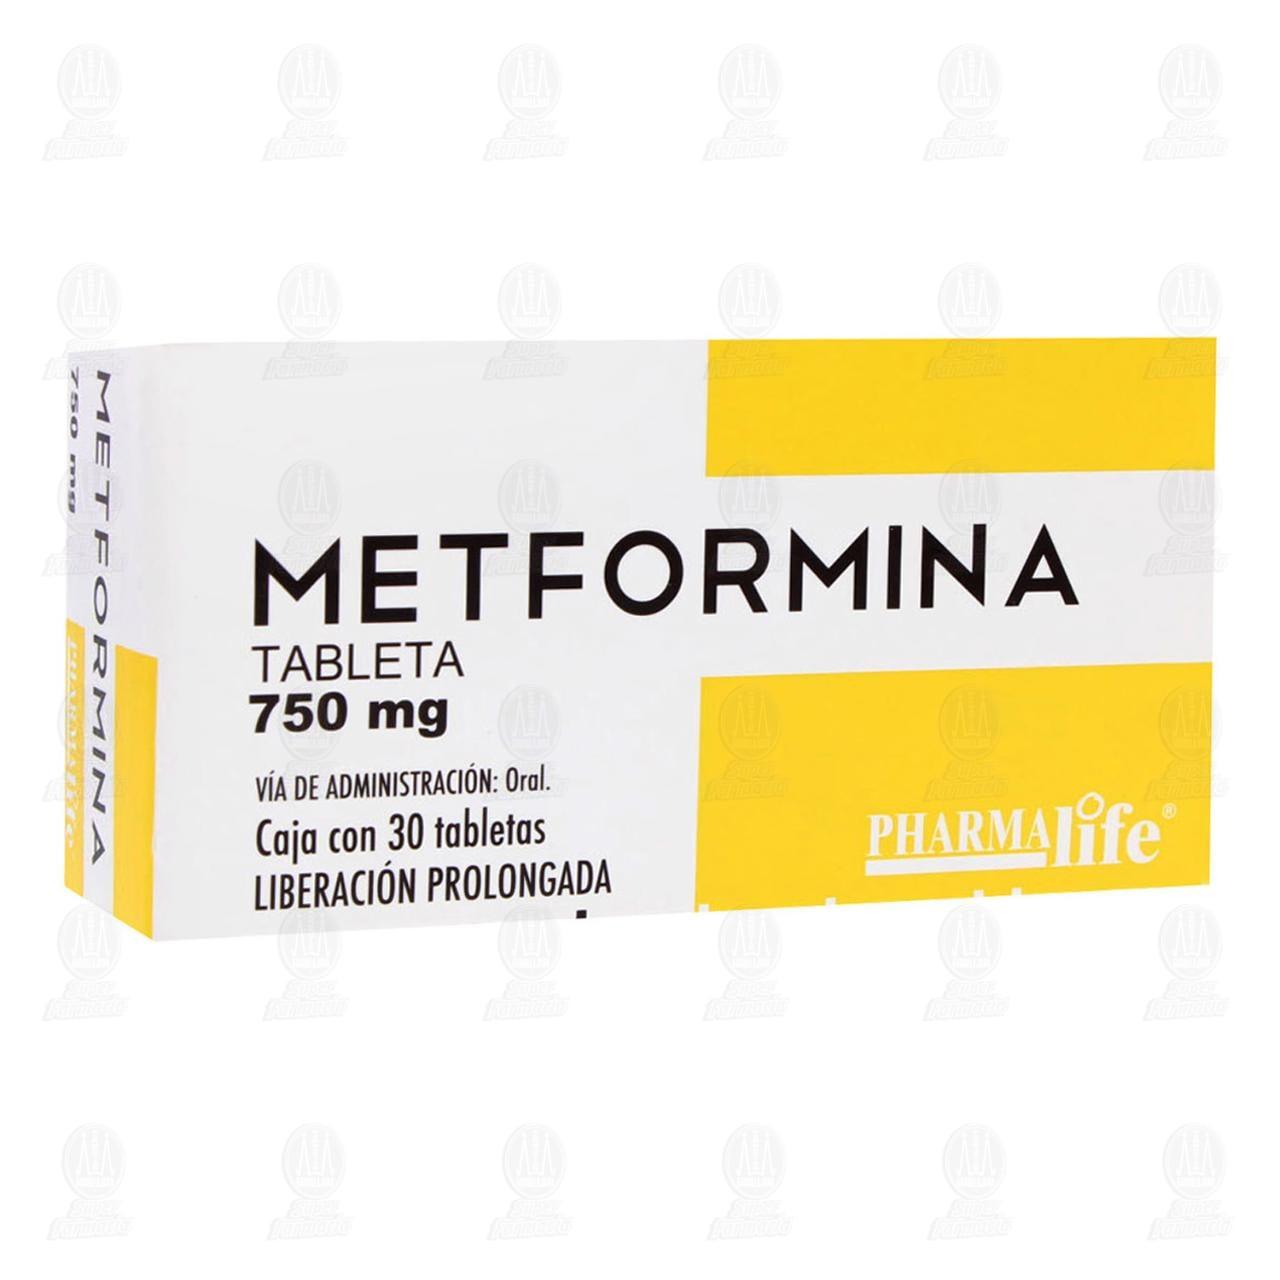 Comprar Metformina 750mg 30 Tabletas Pharmalife en Farmacias Guadalajara